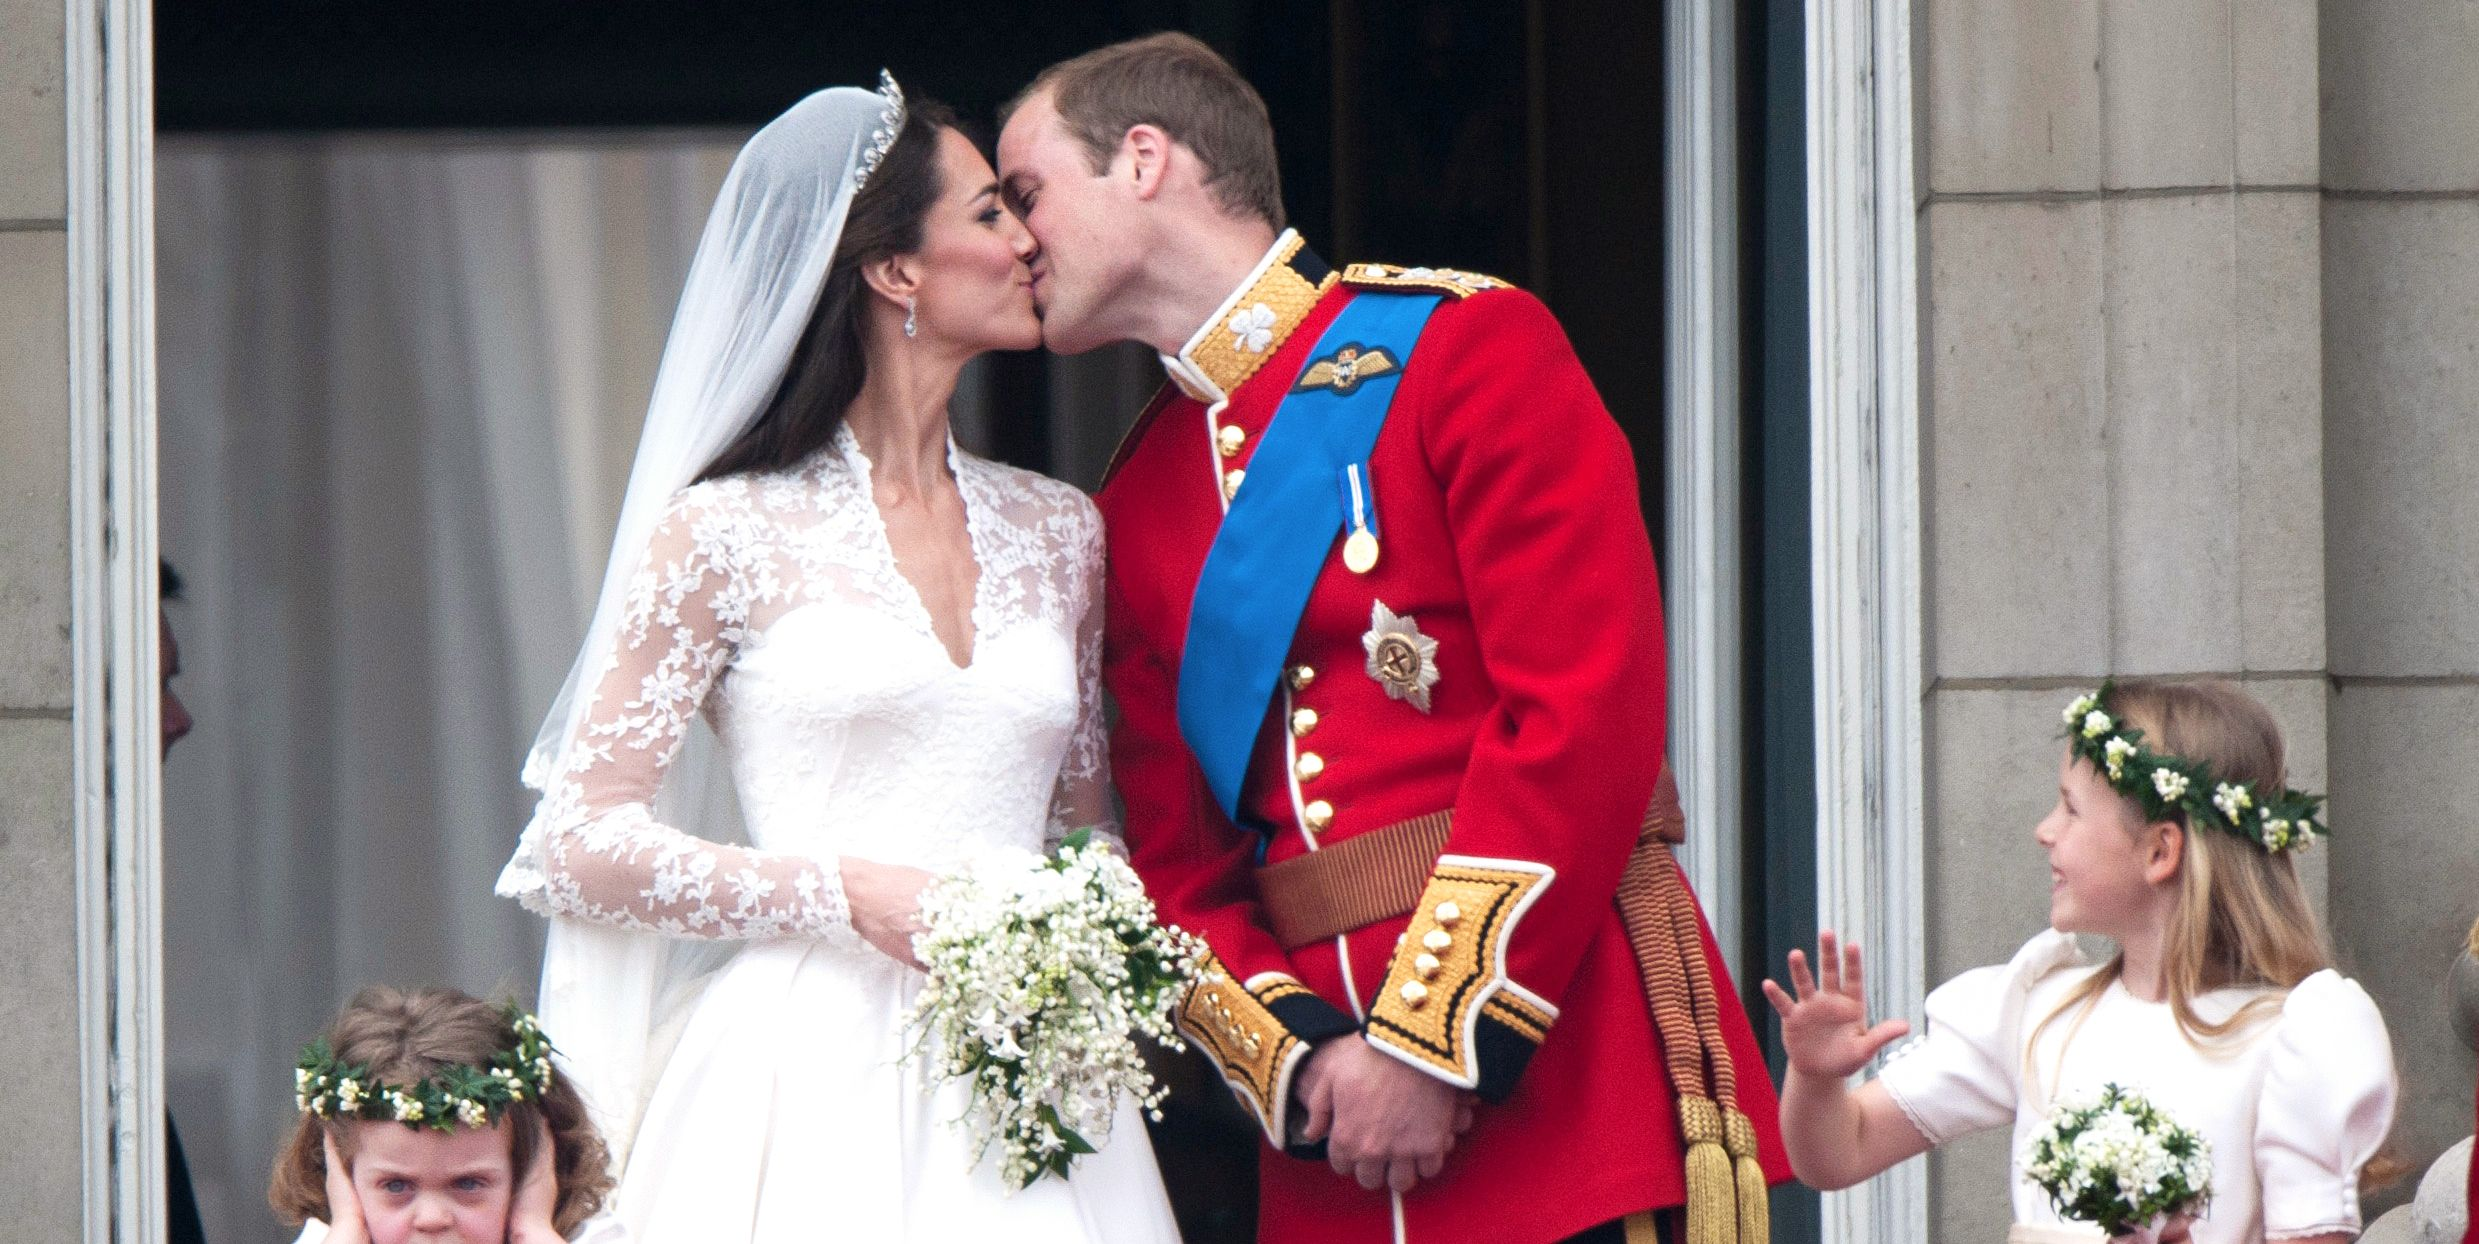 gettyimages 462718555 1512742368 fix 1512751192.jpg?crop=1.00xw:0.736xh;0,0 - William Kate Wedding Date